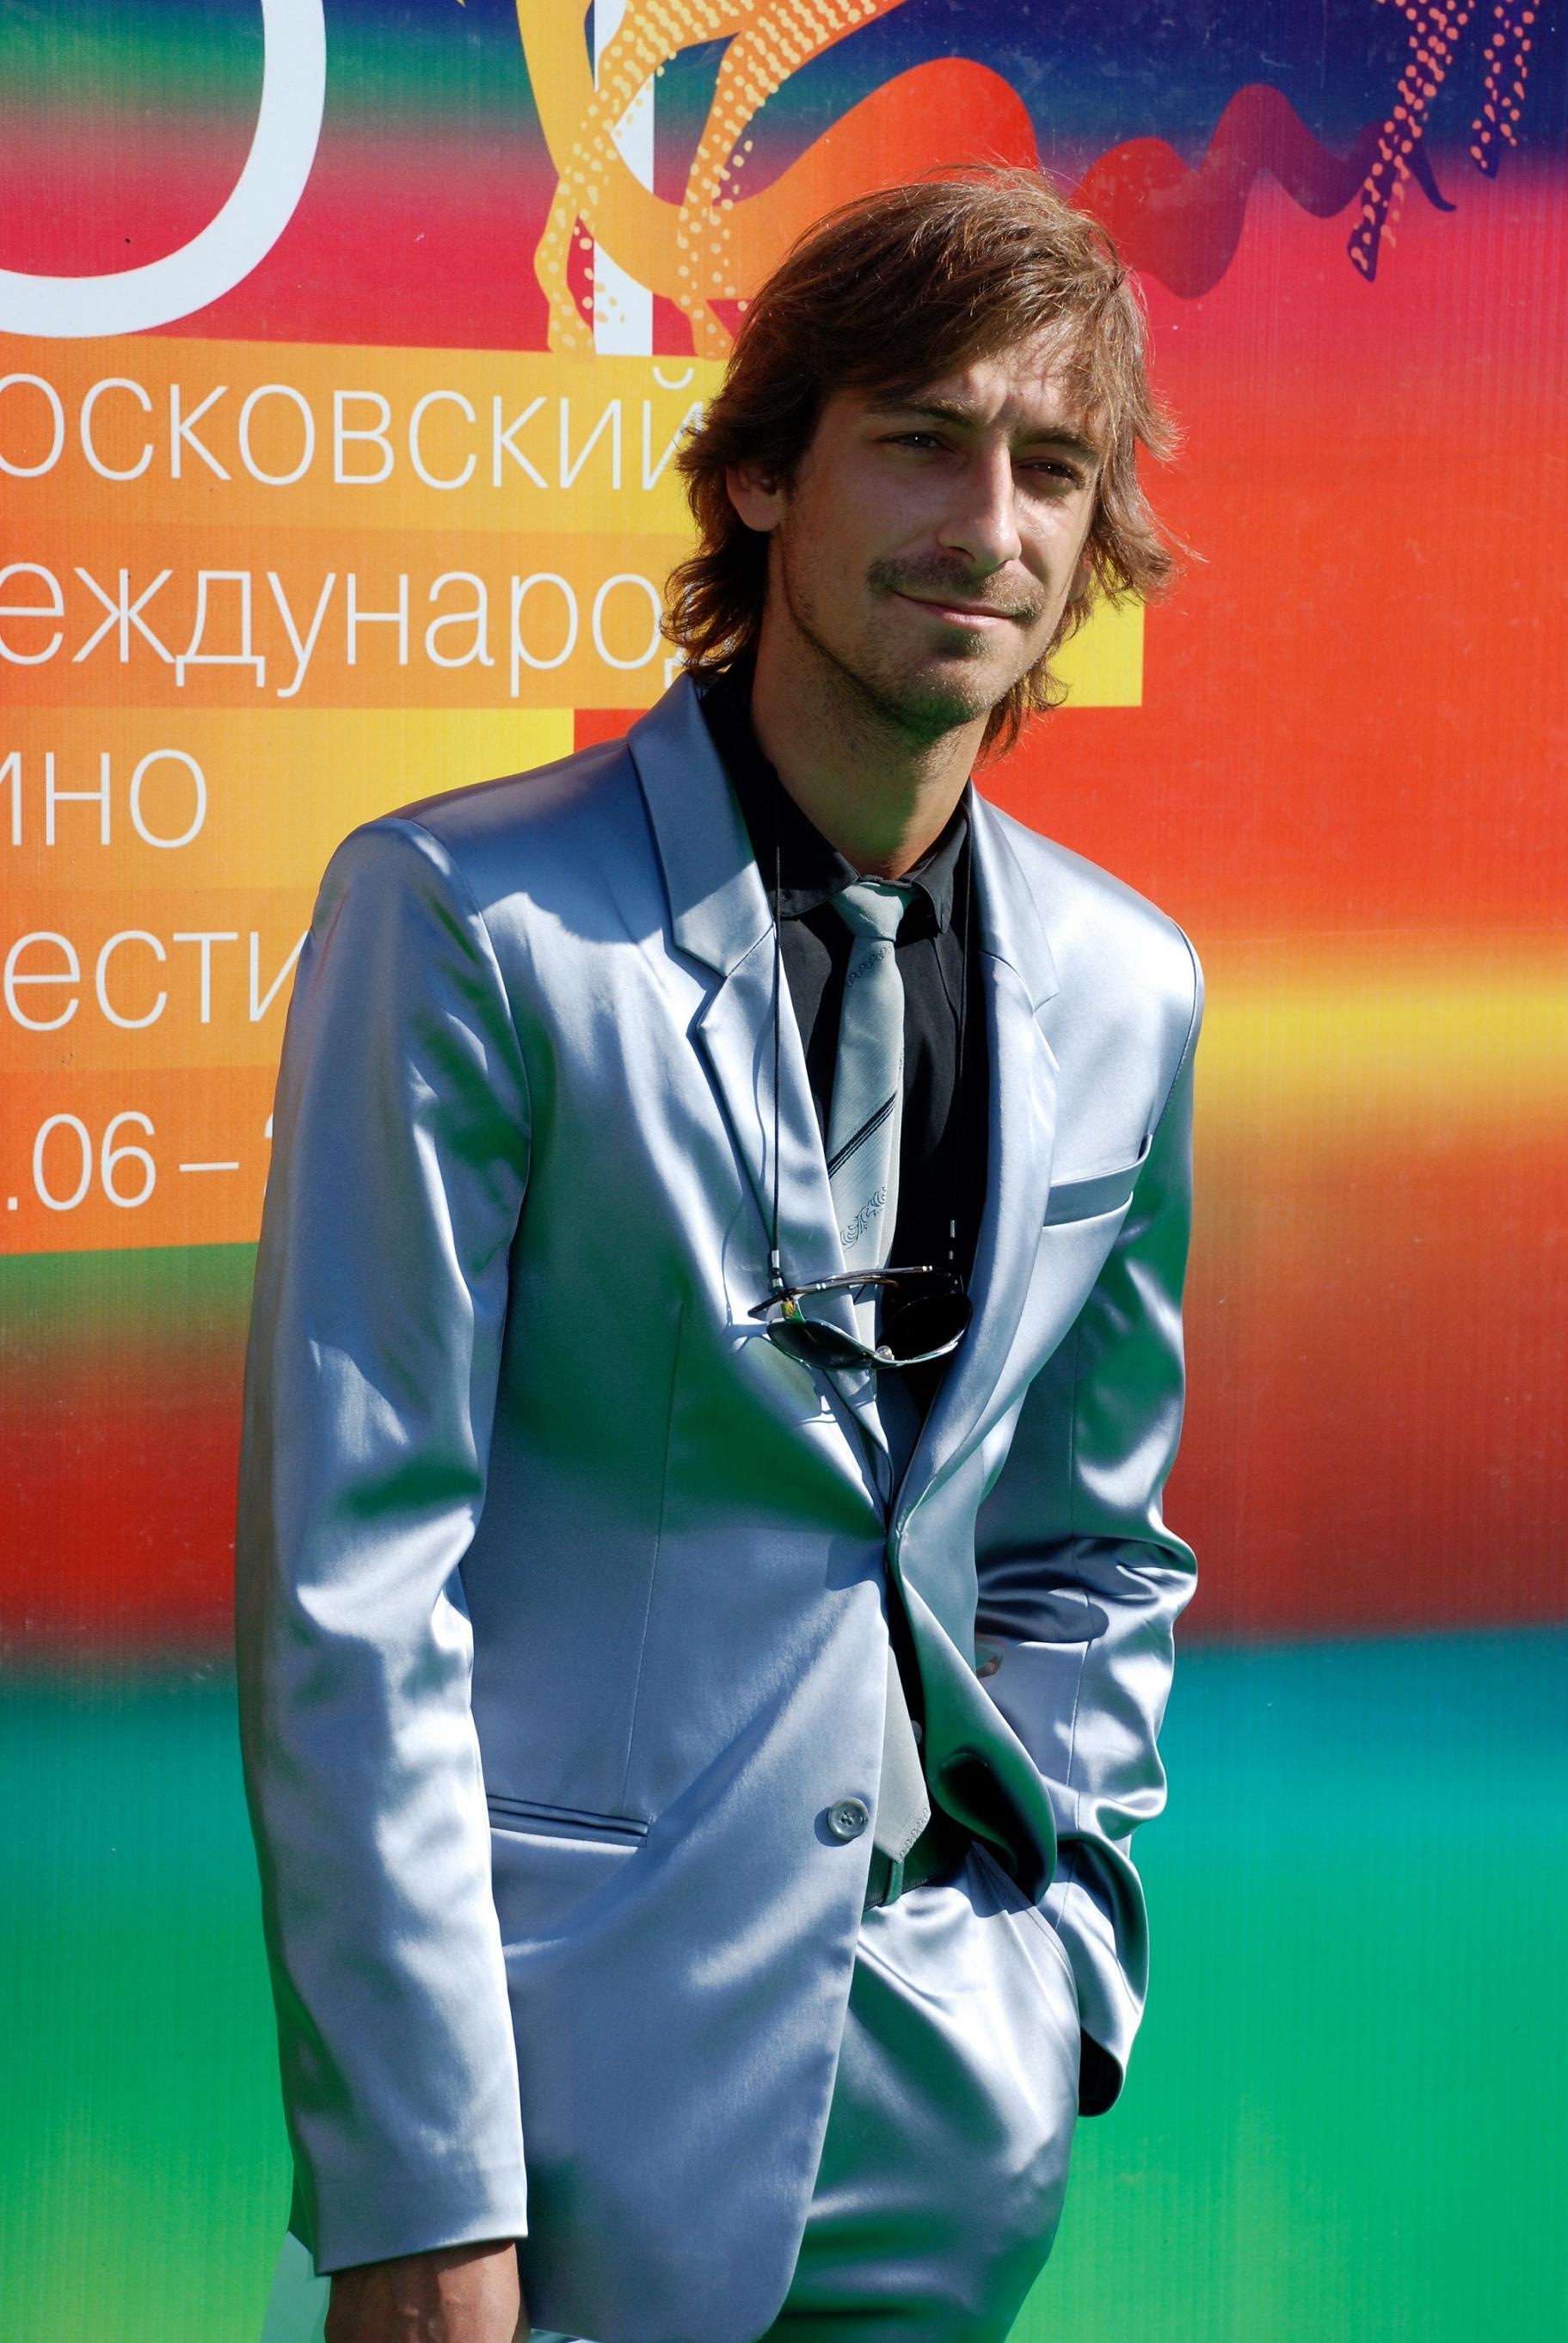 Artem Tkachenko